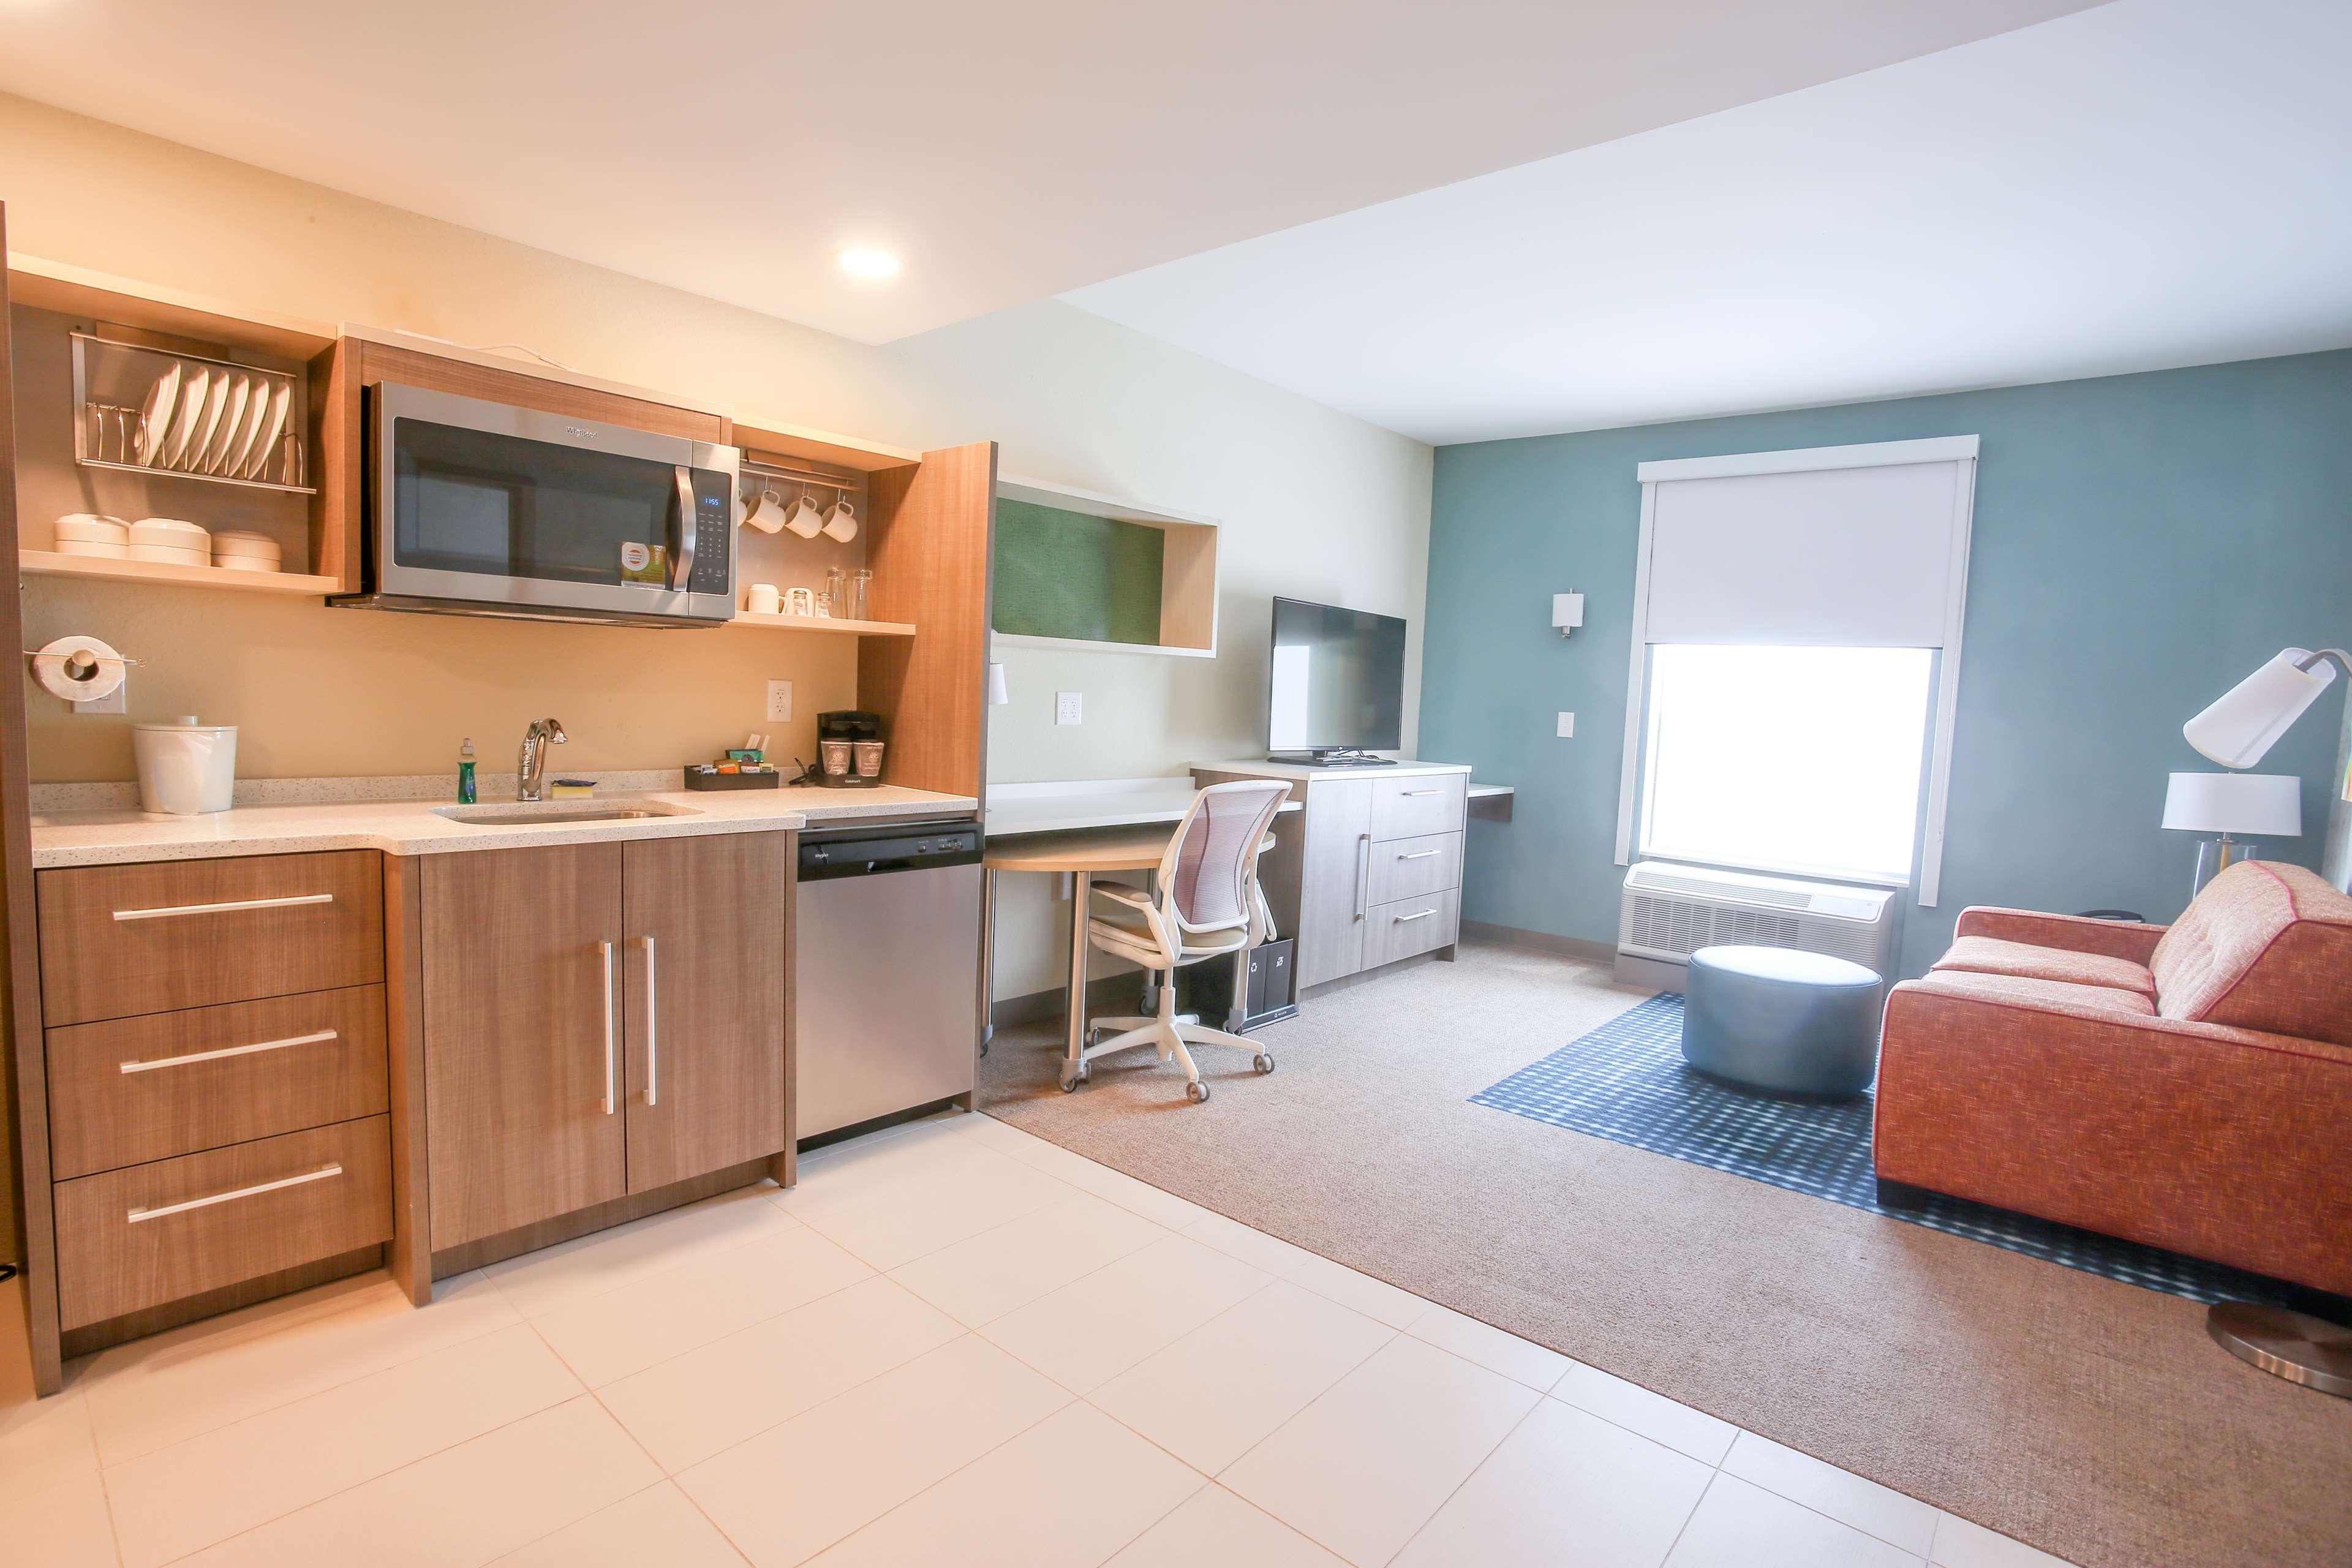 Home2 Suites by Hilton Bordentown image 25